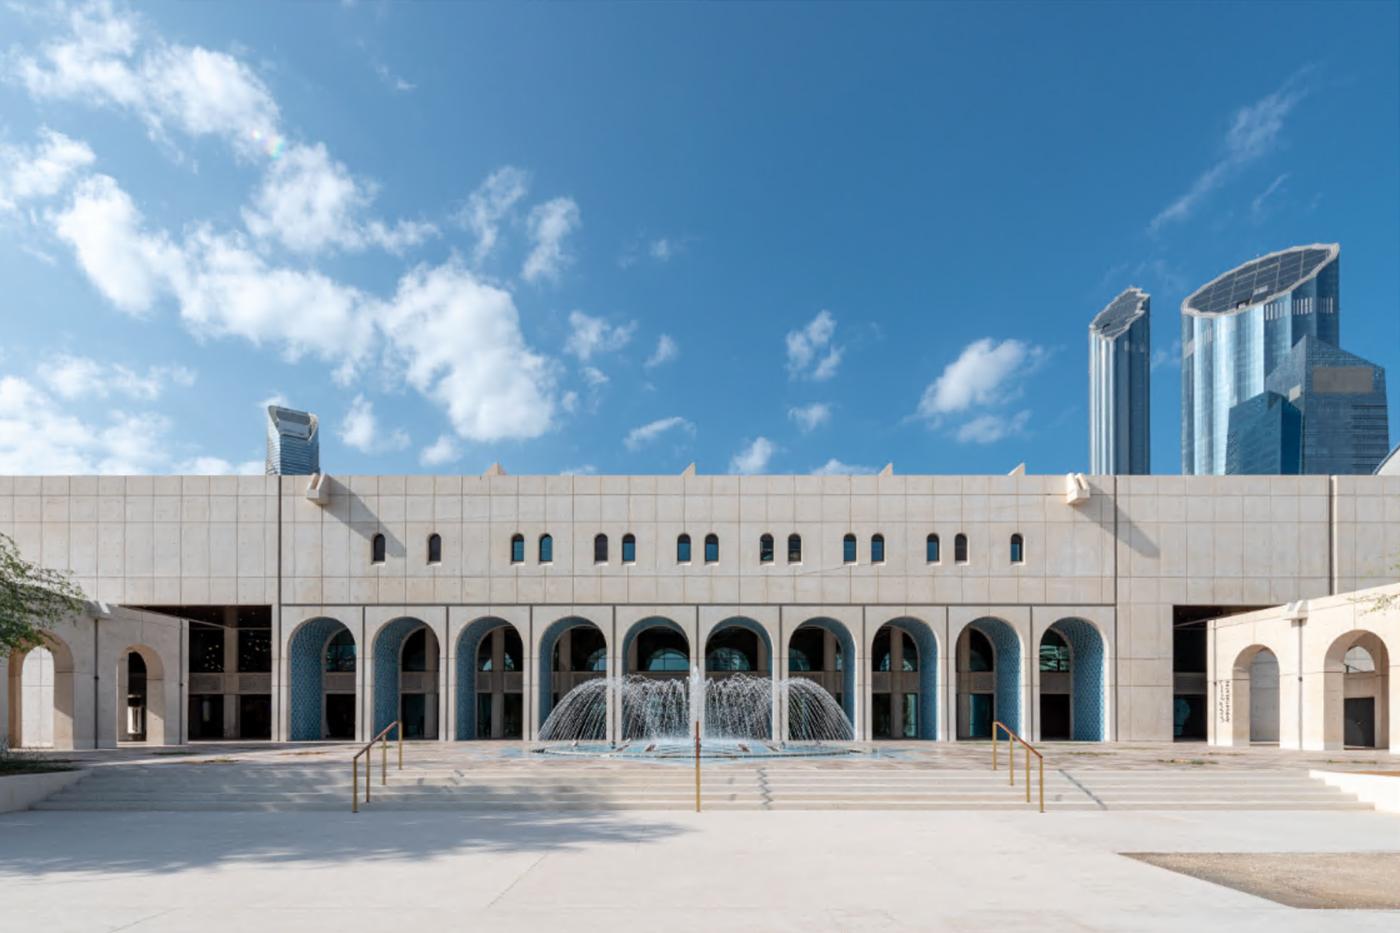 Cultural Foundation Qasr Al Hosn Elgaard Architecture